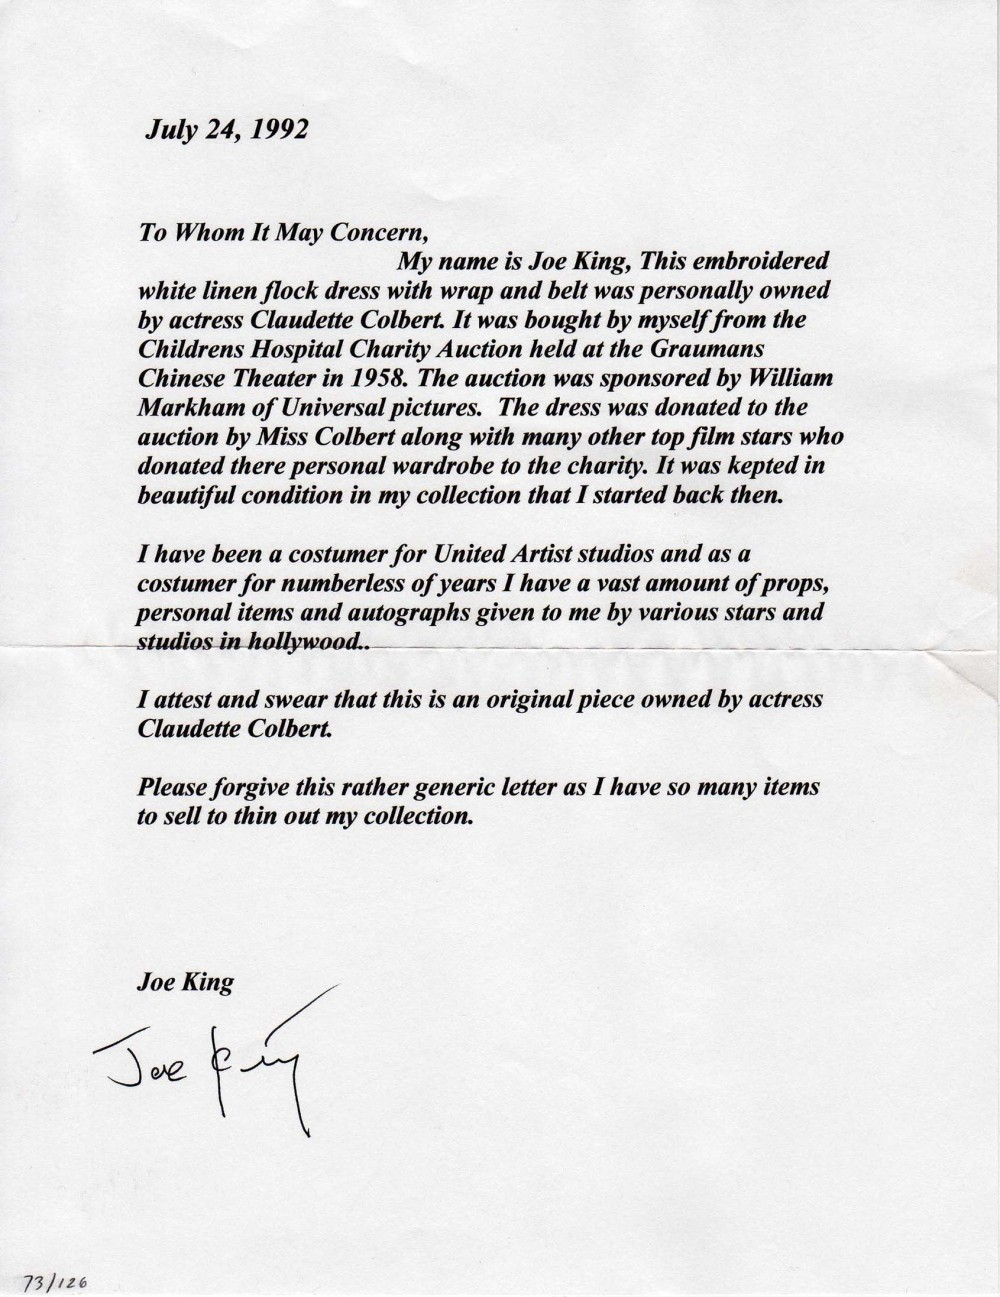 Ebays Stonark And Liieviione Comparing Joe King Signatures Loas